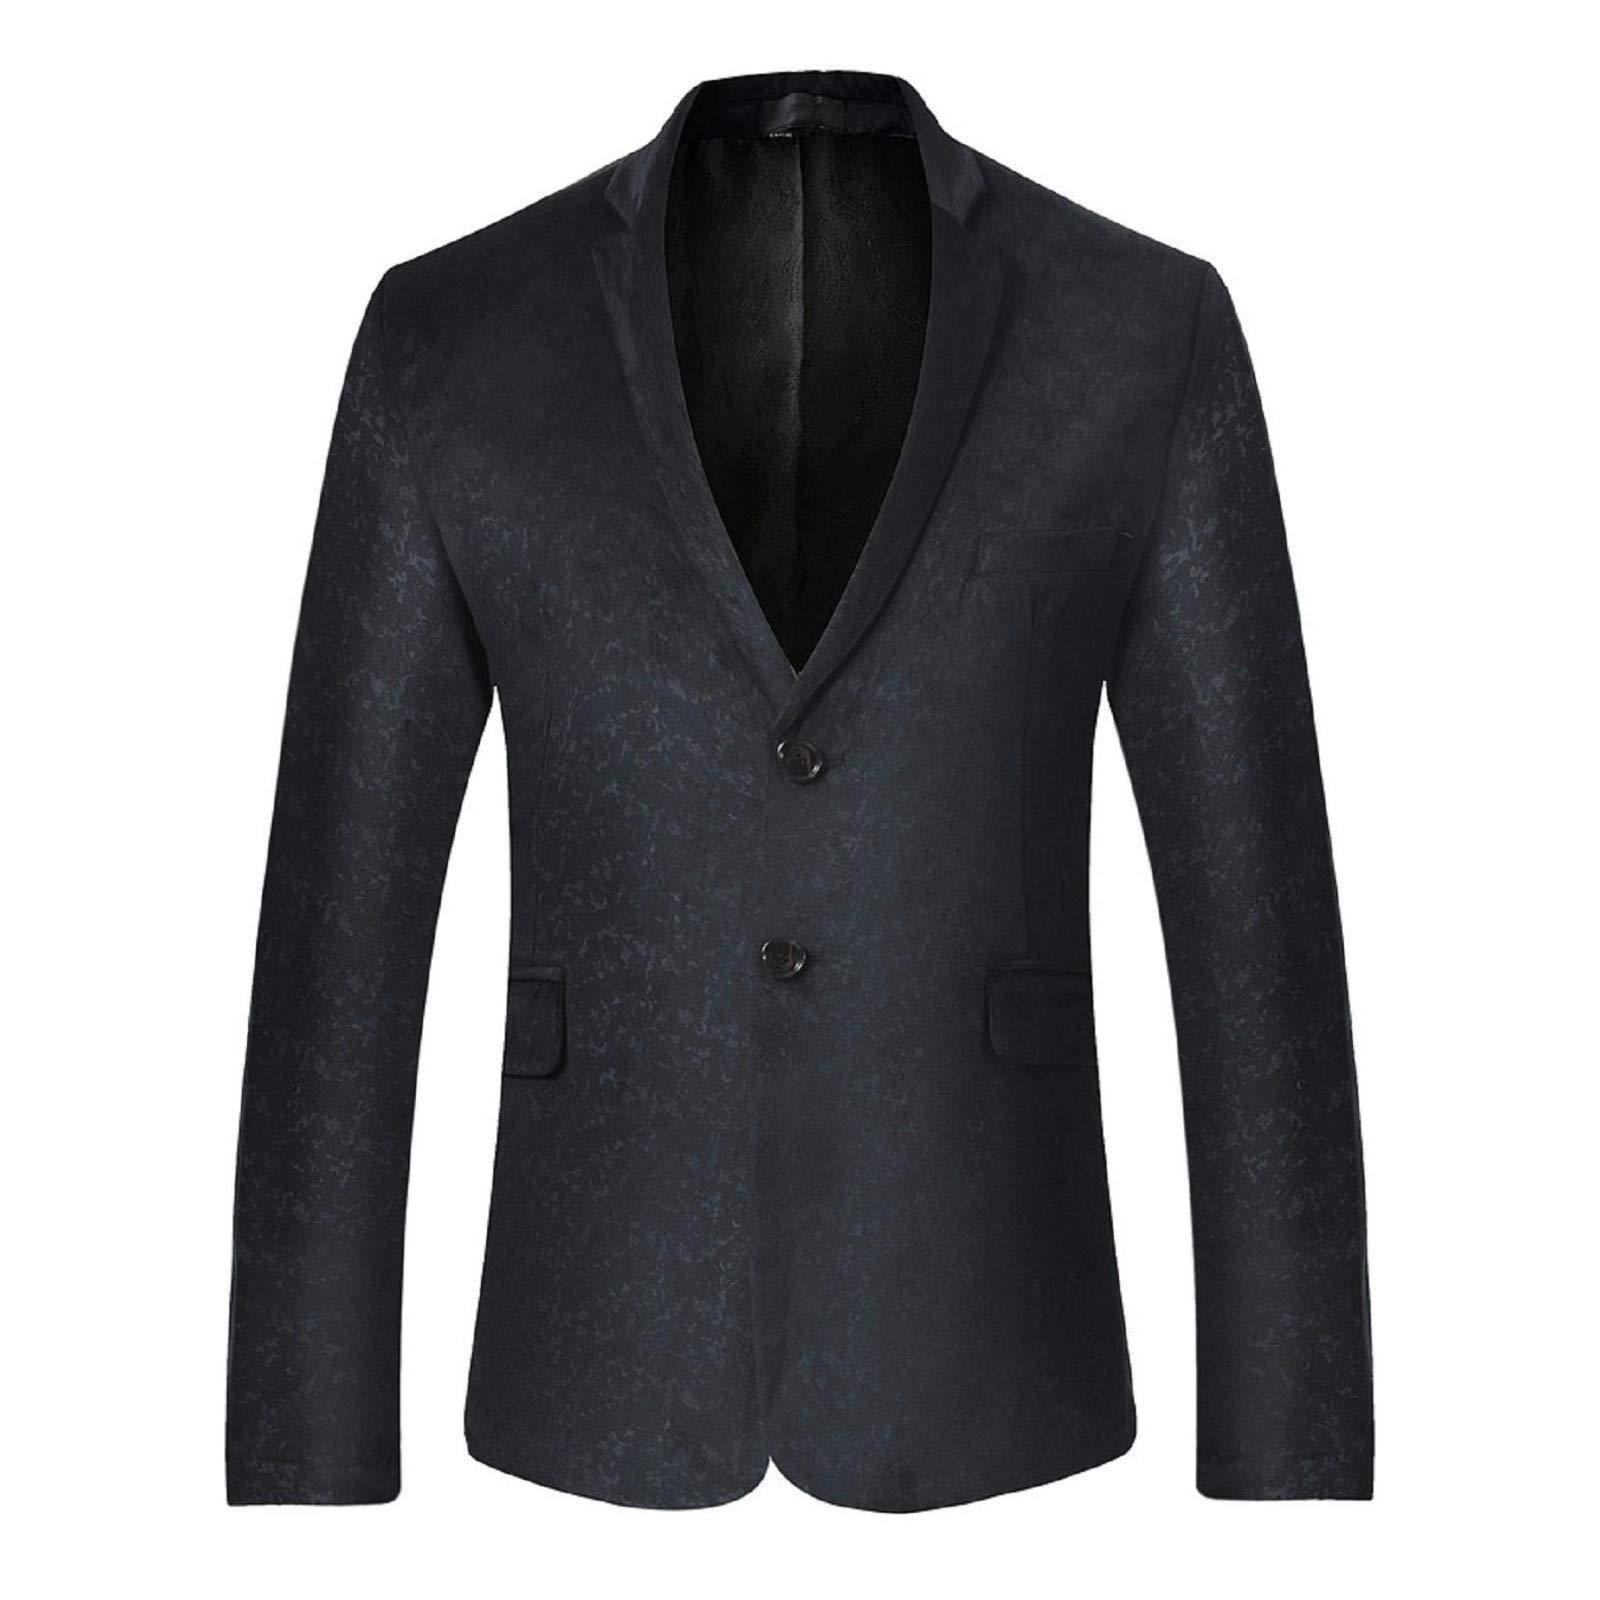 BingYELH Prom Suit for Men,Men's Floral Party Suit Slim Fit Stylish Dinner Jacket Wedding Blazer Prom Black